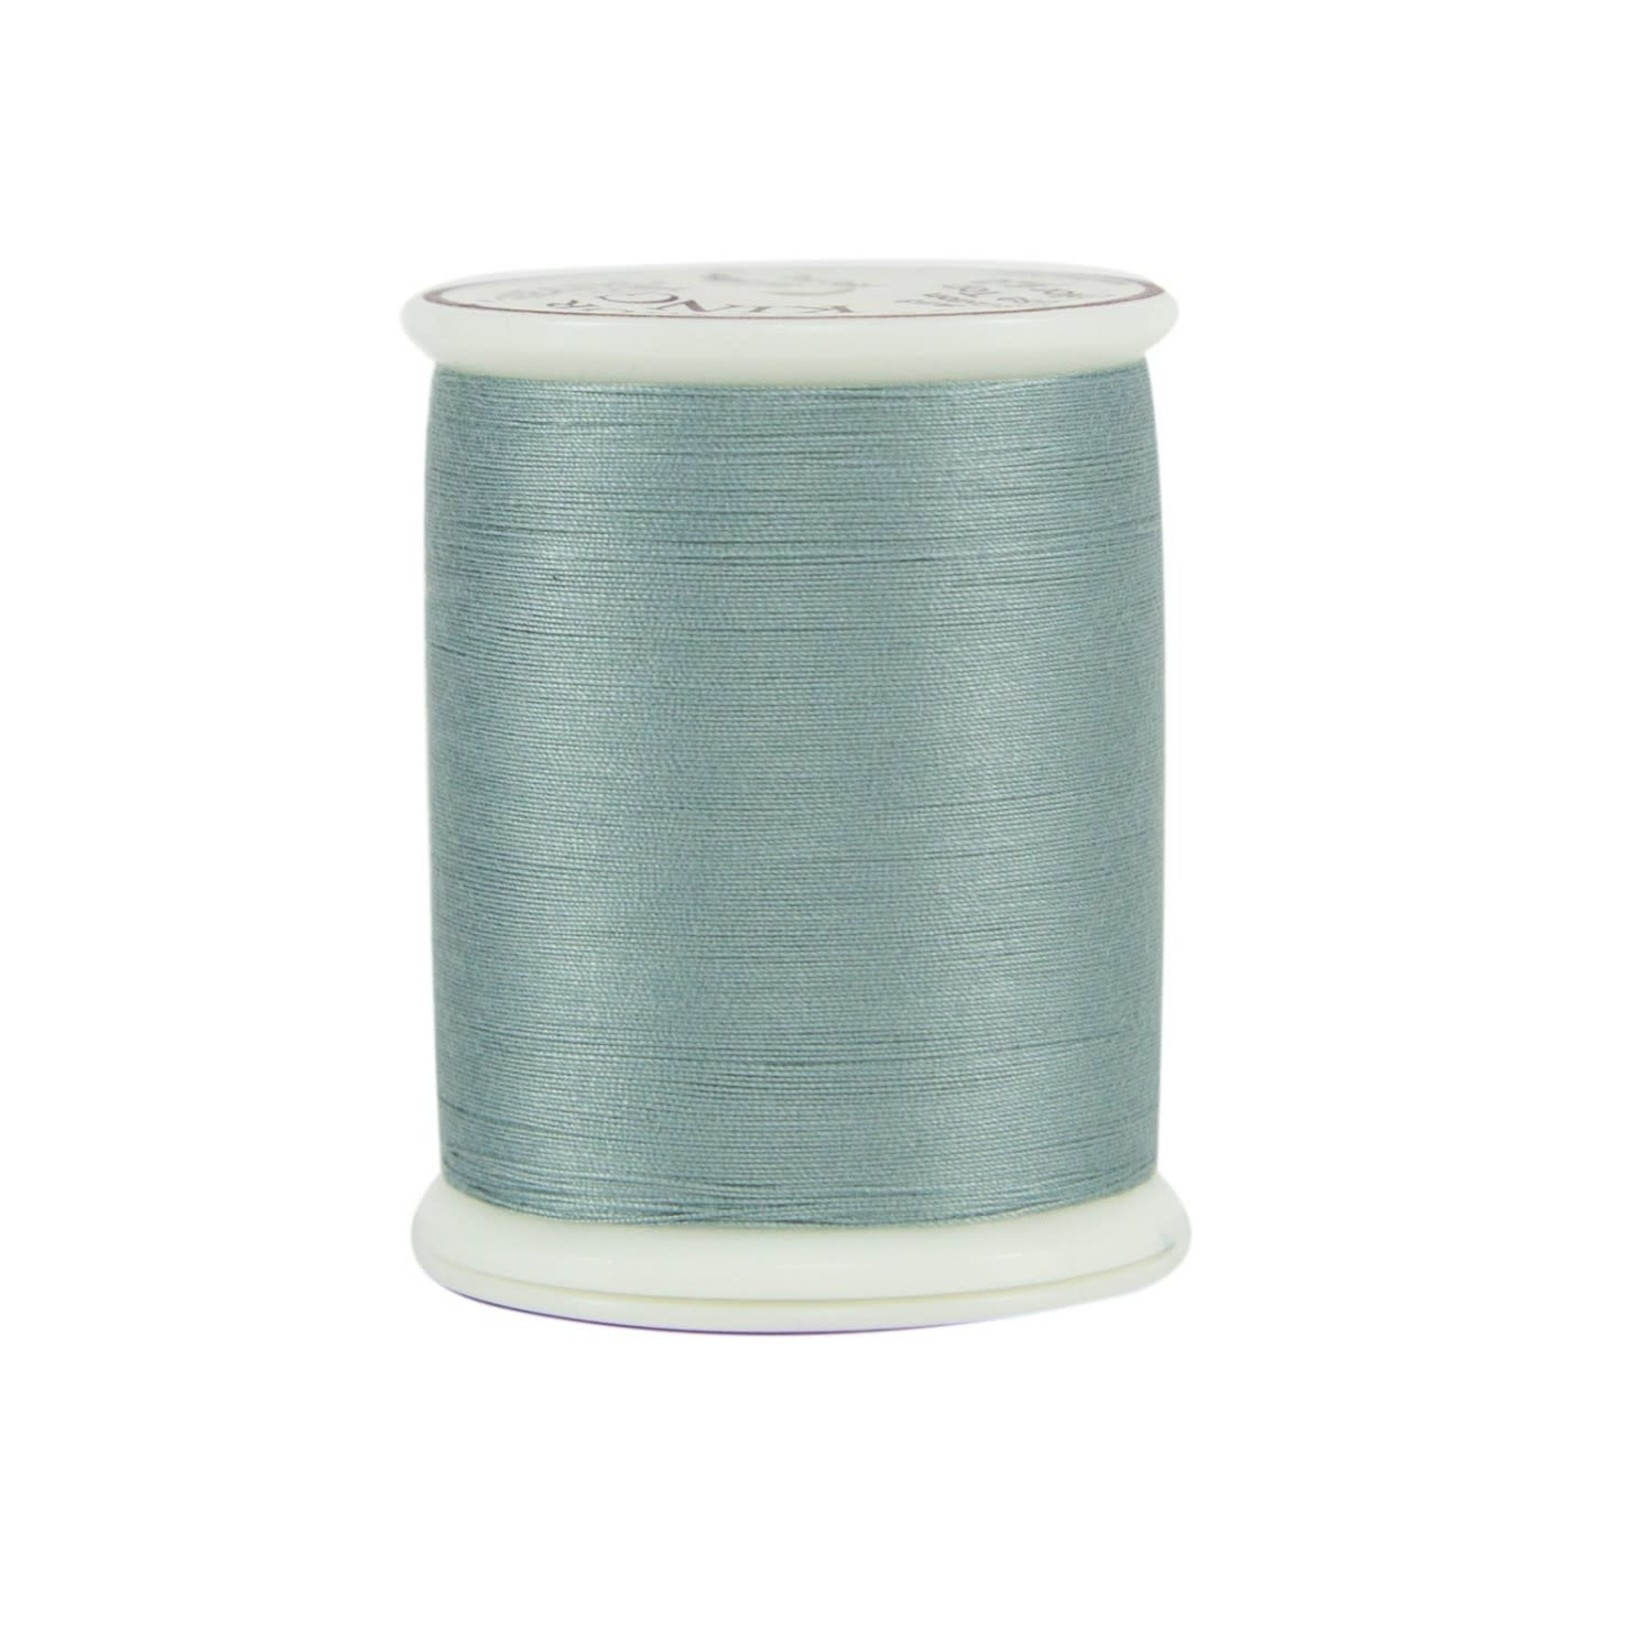 Superior Threads King Tut - #40 - 457 m - 1025 Rainy Days